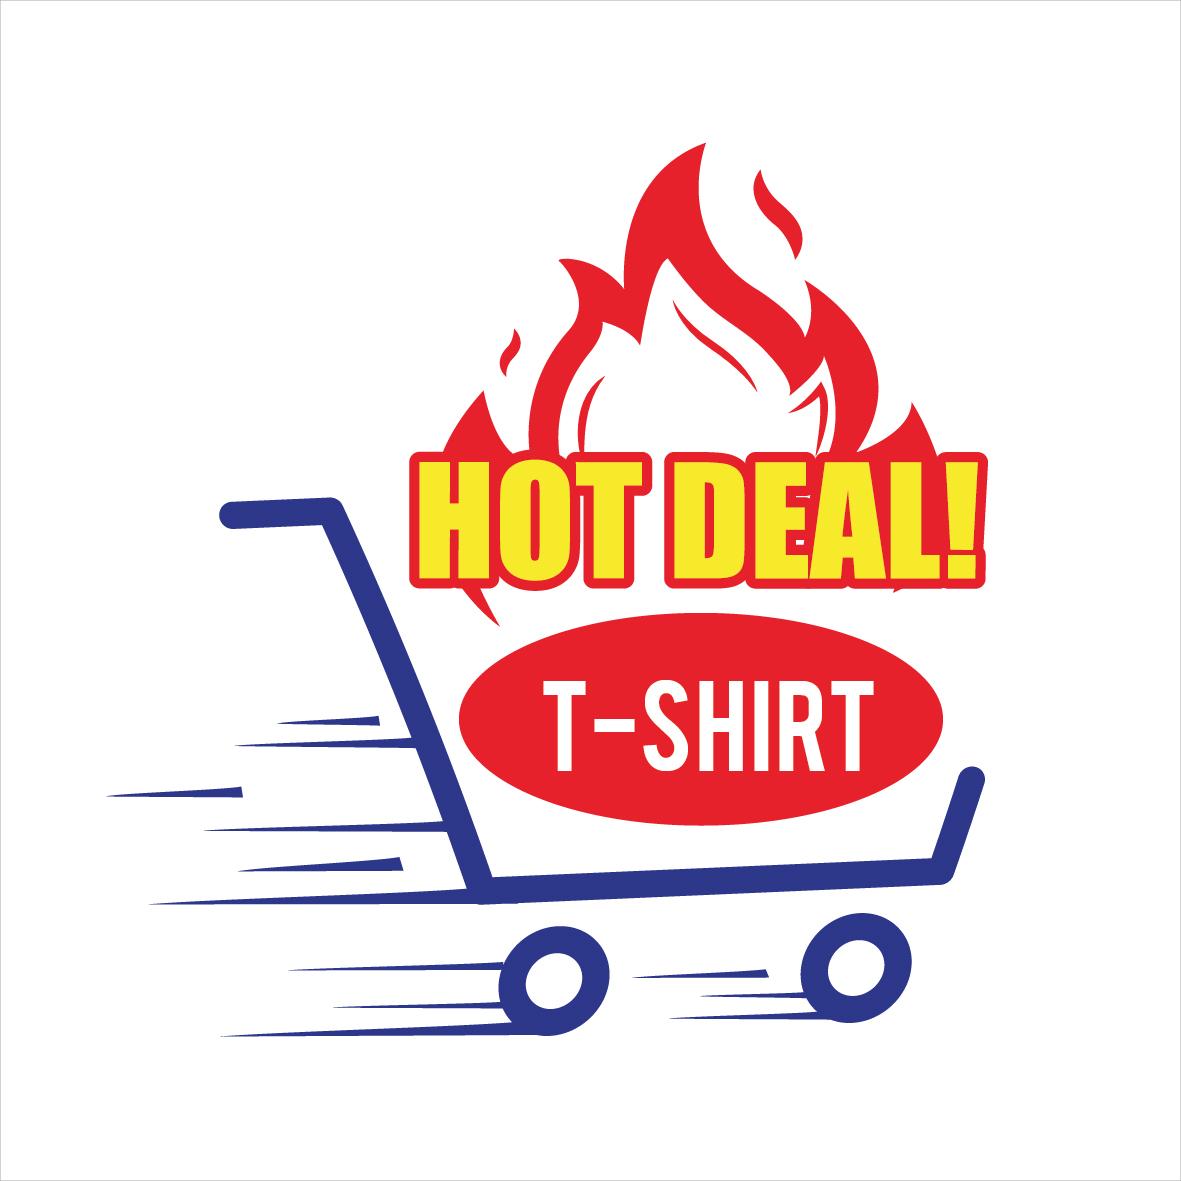 Couple T shirt A4 size (Male & Female)